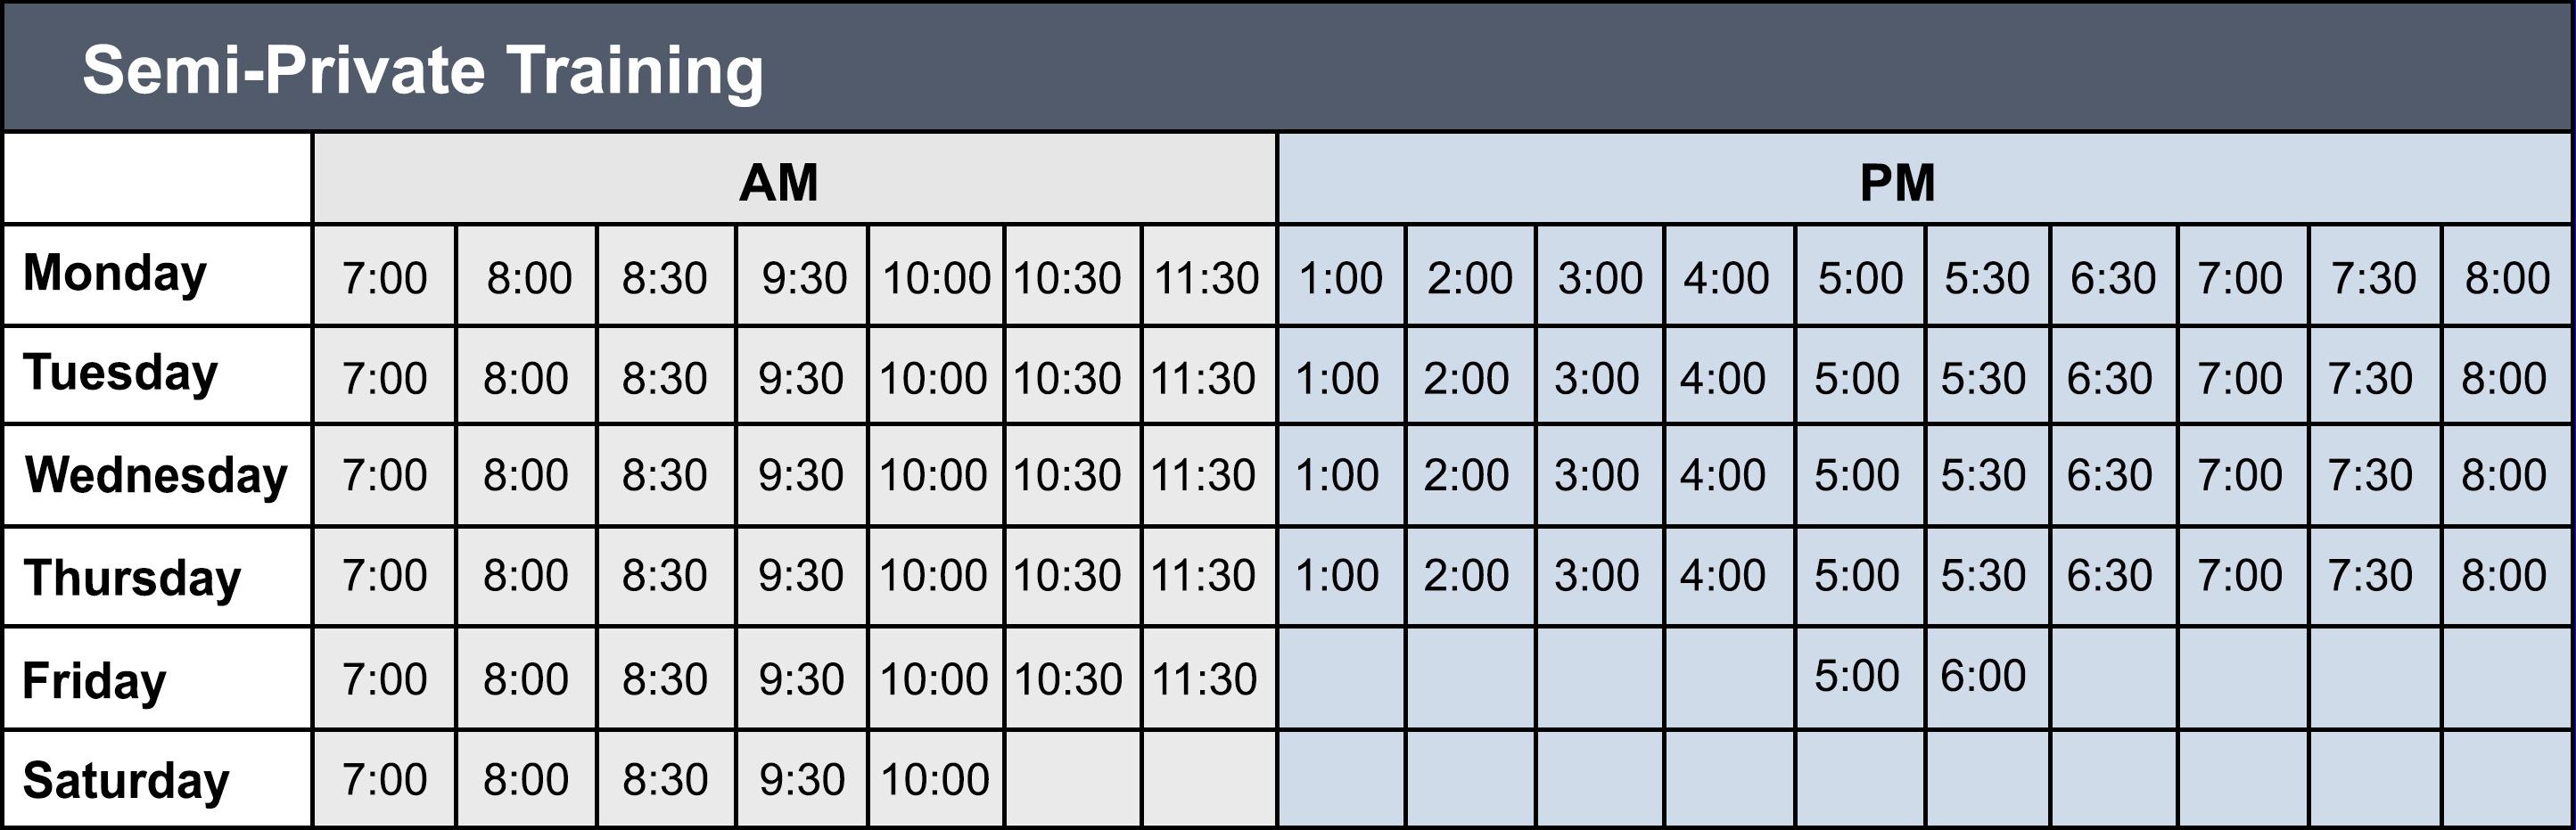 Timetable-Semi PT-1.jpg